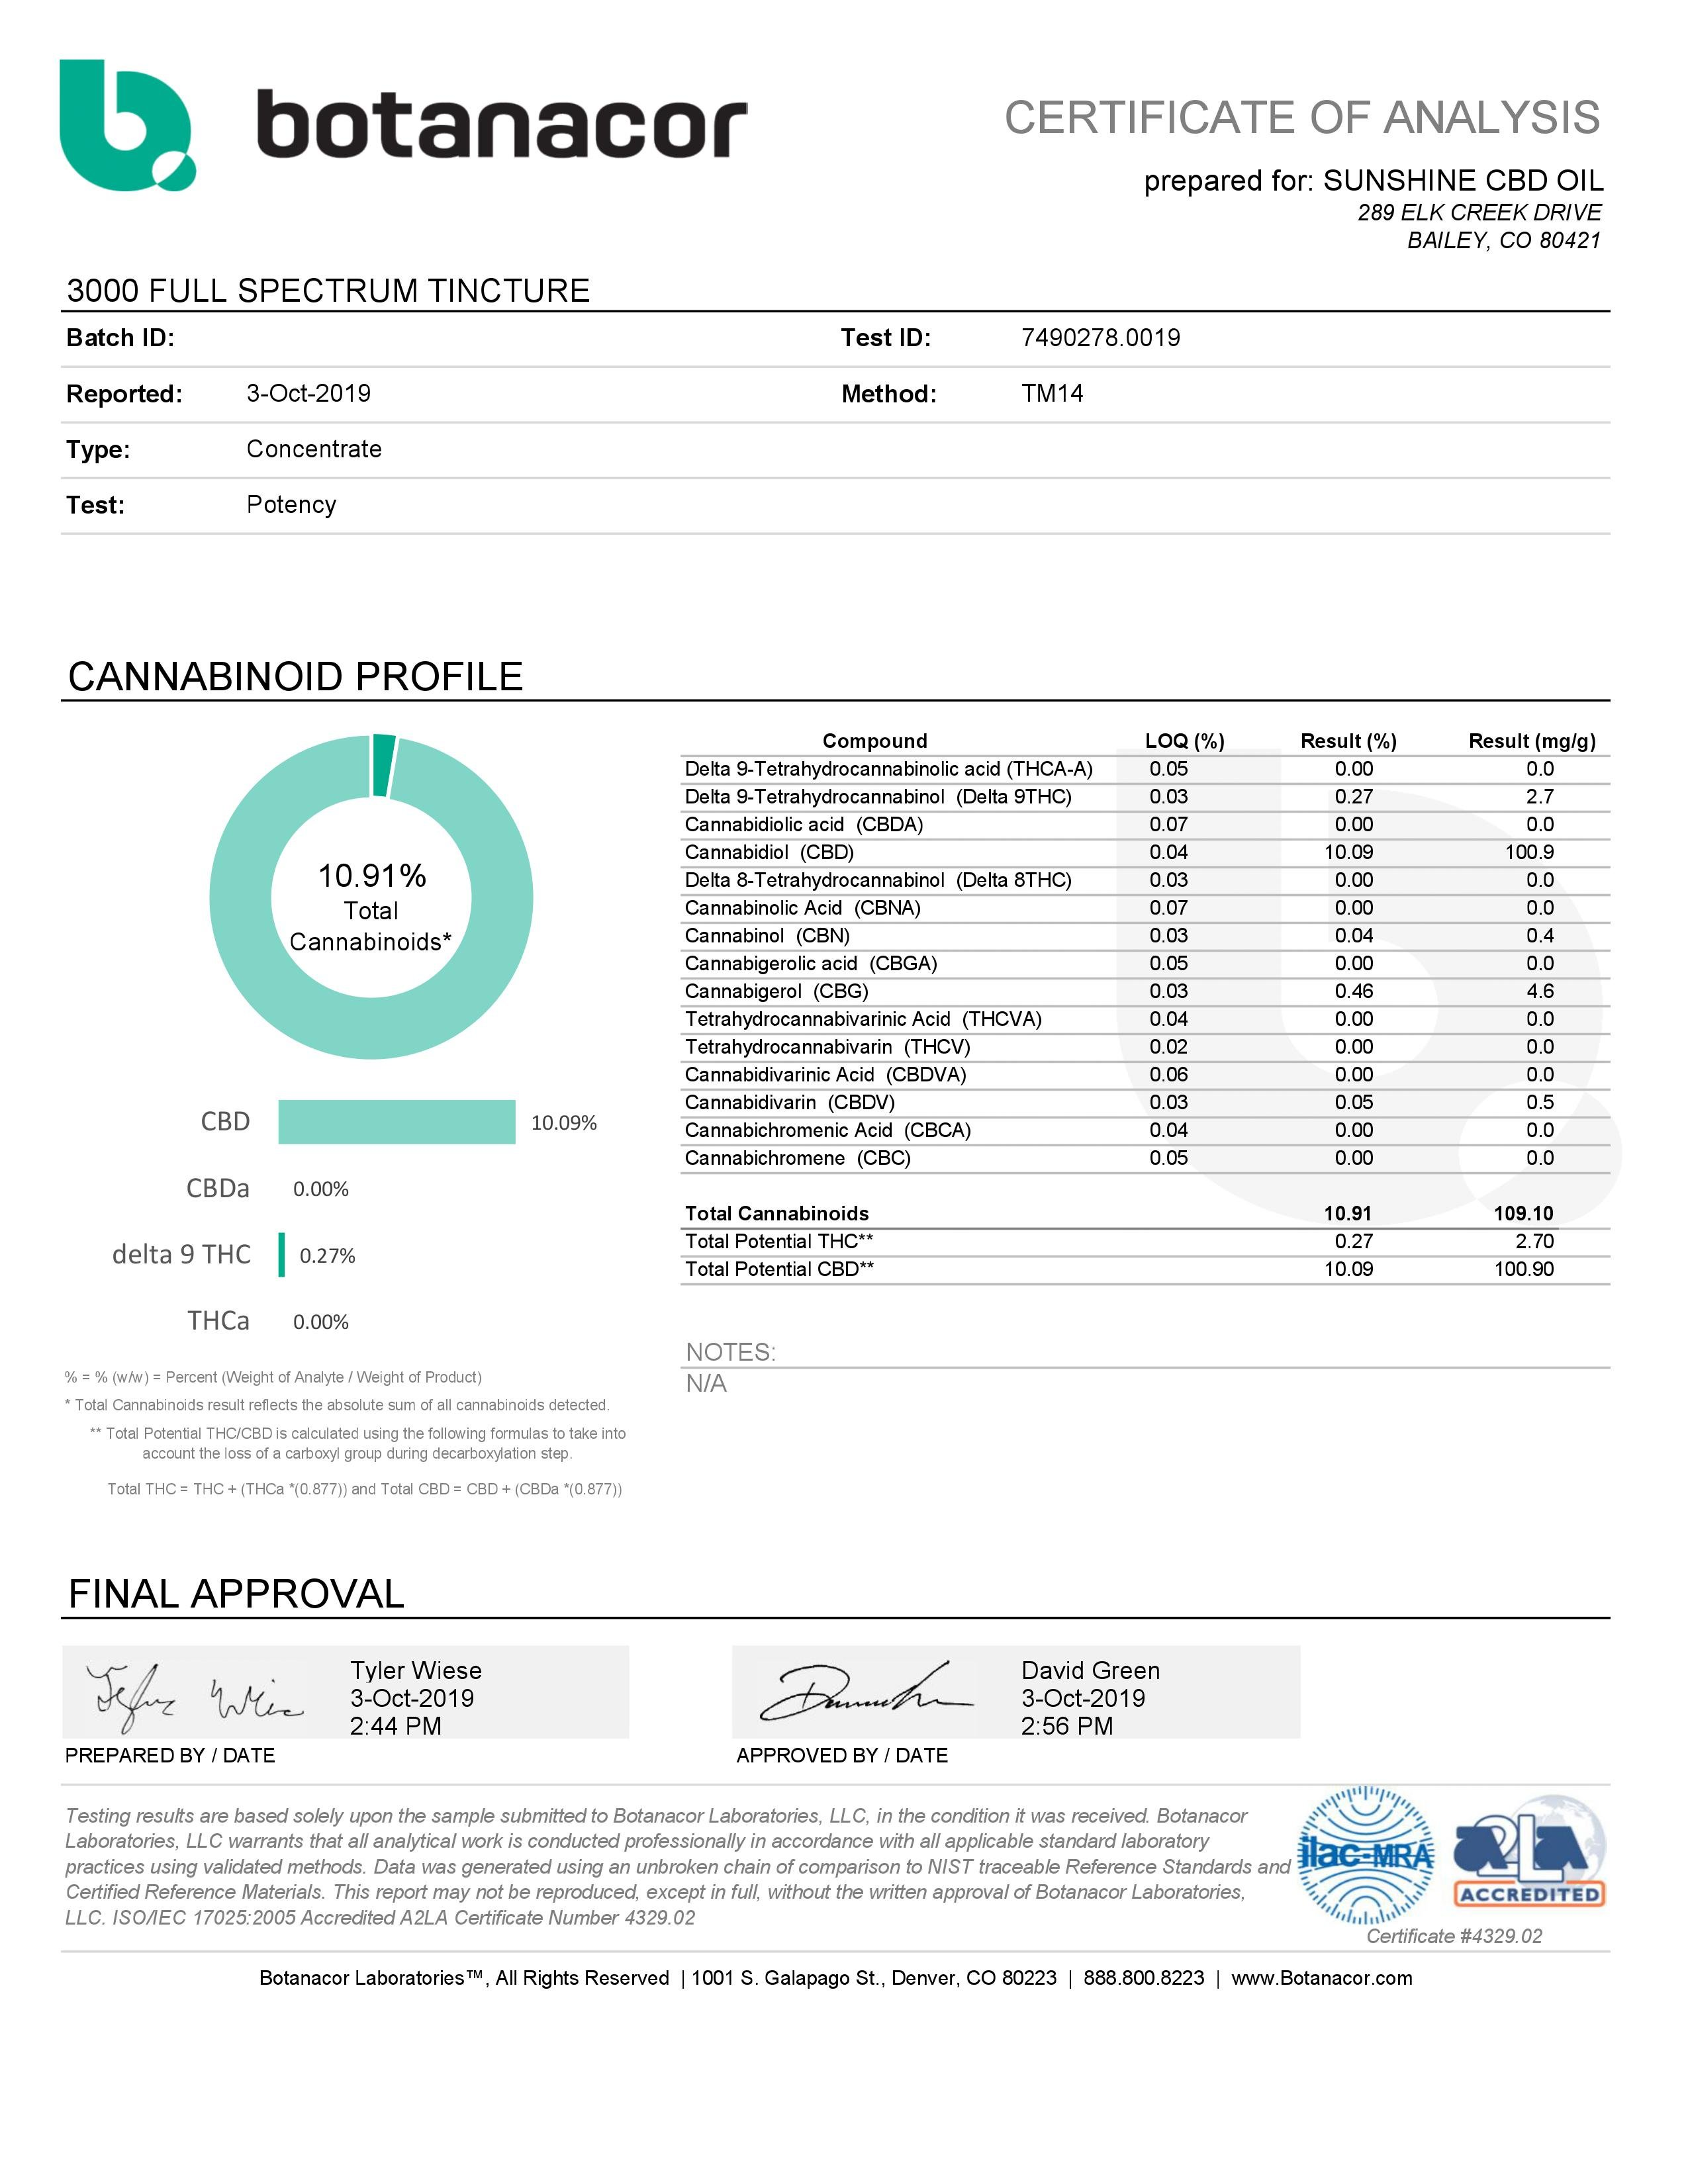 3000mg Full Spec Potency Test